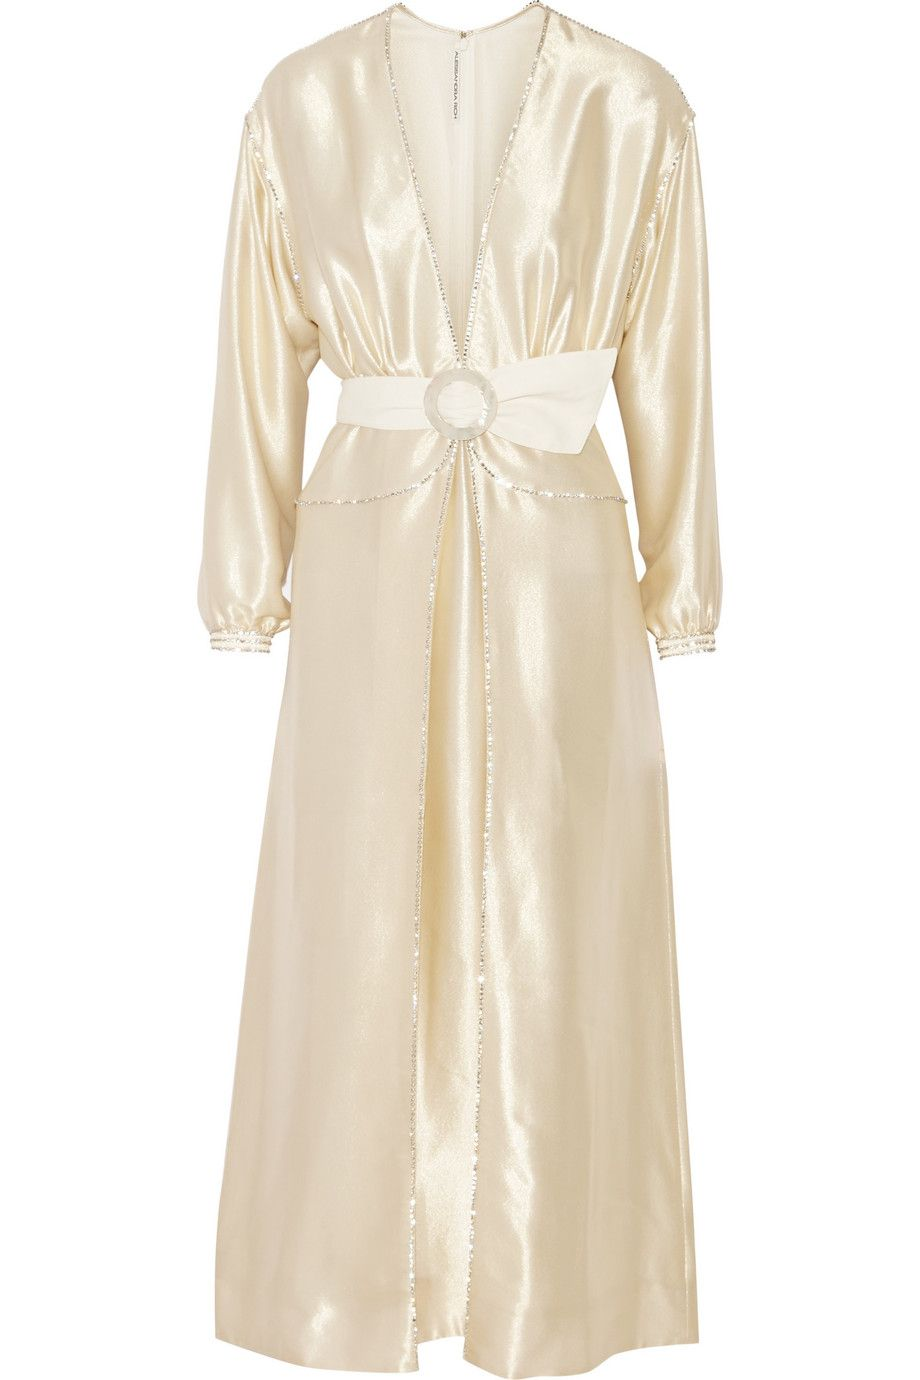 3 4 sleeve silk saree blouse designs alessandra richcrystalembellished lamé gown  i do  pinterest